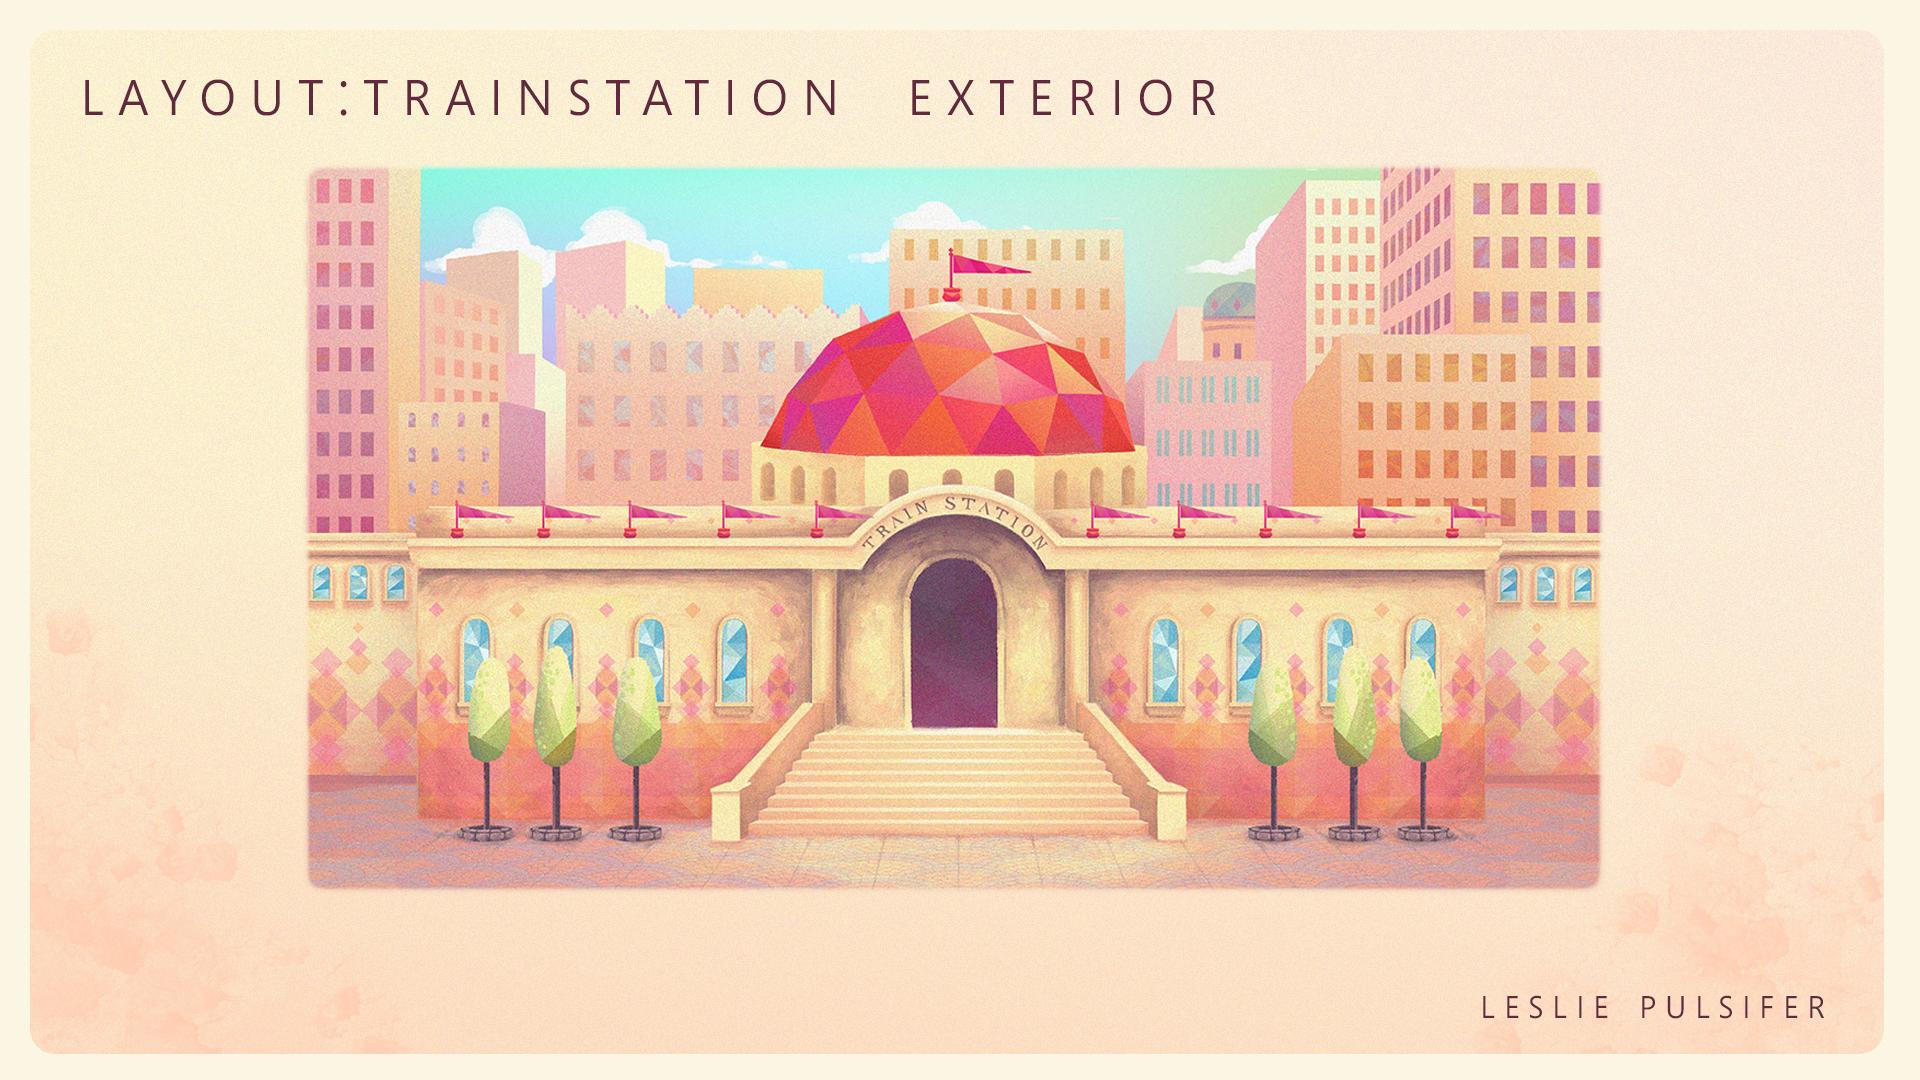 Suitcases_layouttrainstationext.jpg